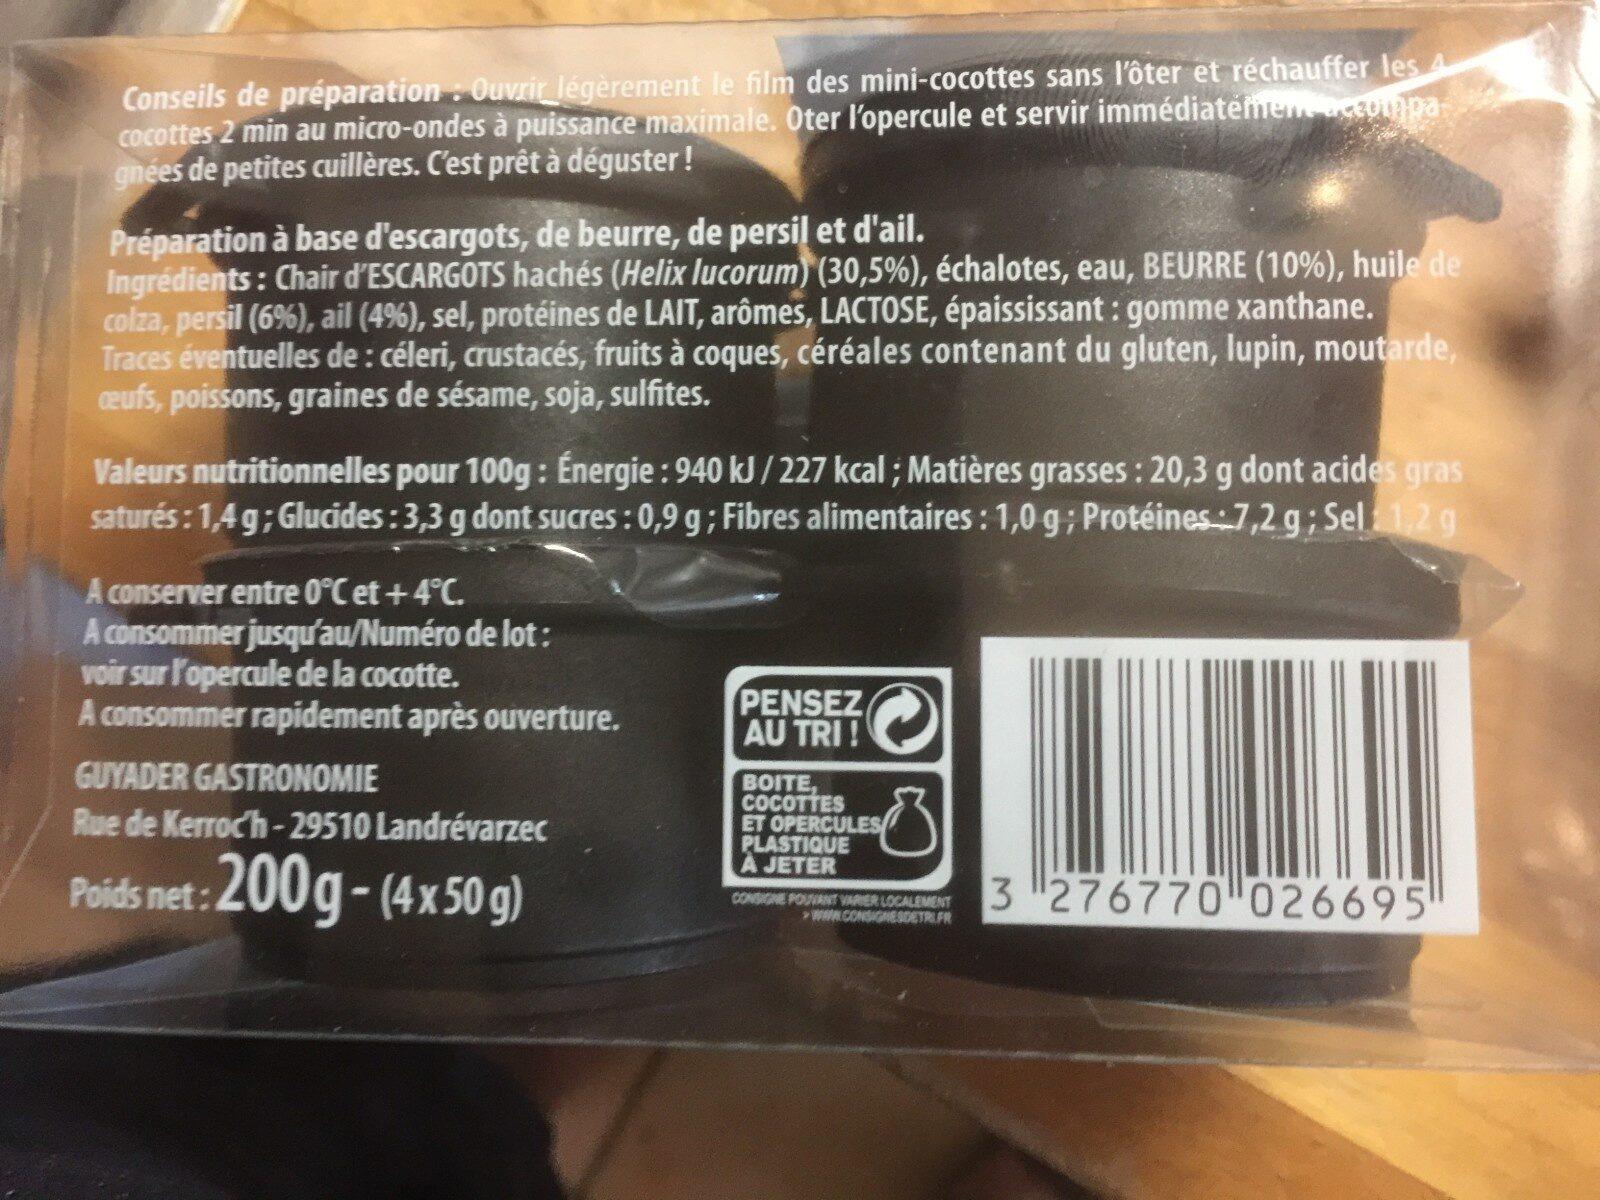 4 Mijotés Escargots et persillade - Inhaltsstoffe - fr